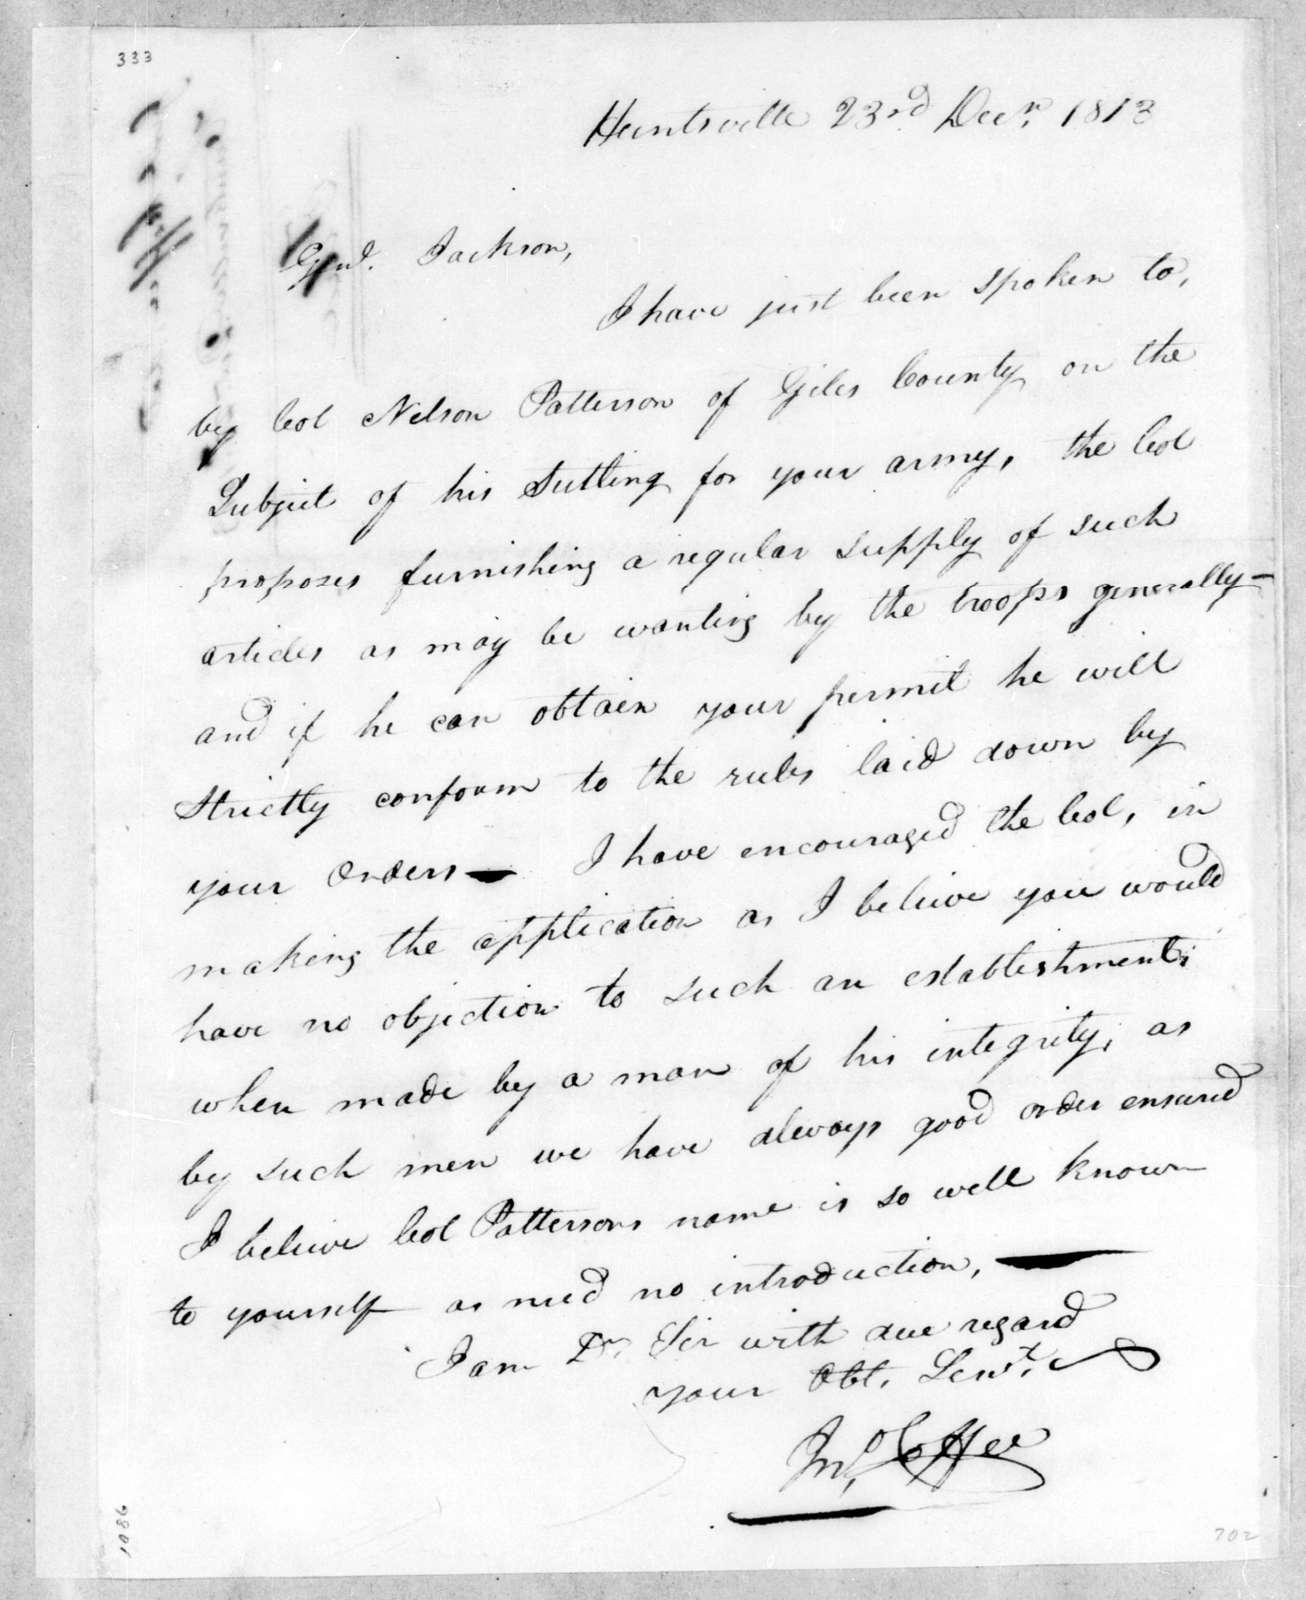 John Coffee to Andrew Jackson, December 23, 1813